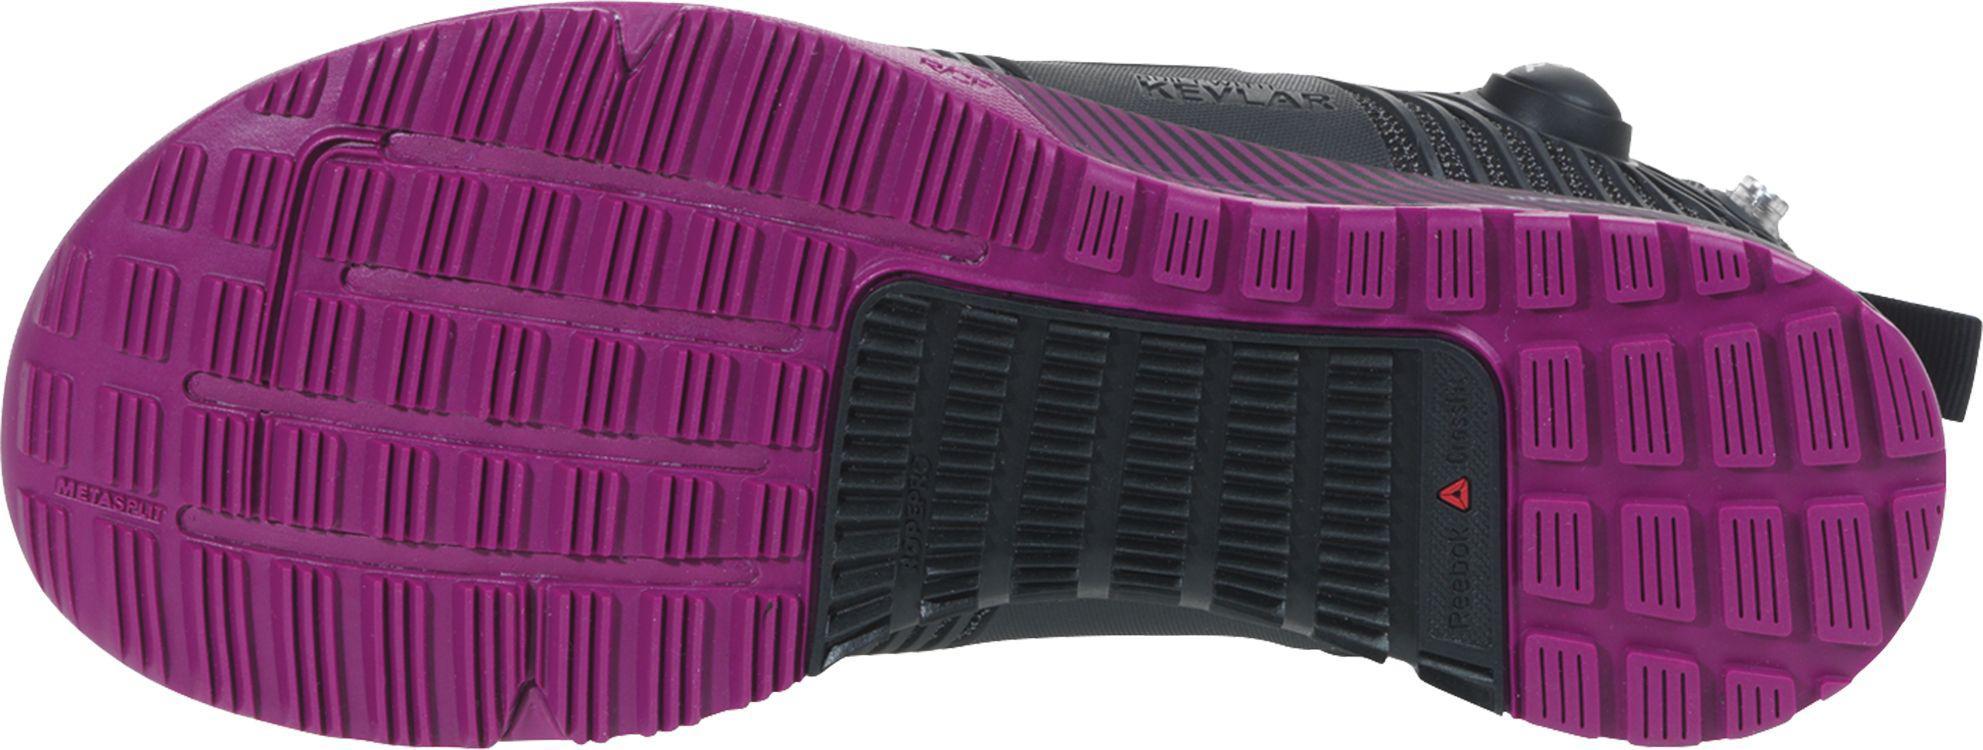 1f8be0ca2cb Lyst - Reebok Crossfit Nano Pump Fusion Training Shoes in Purple